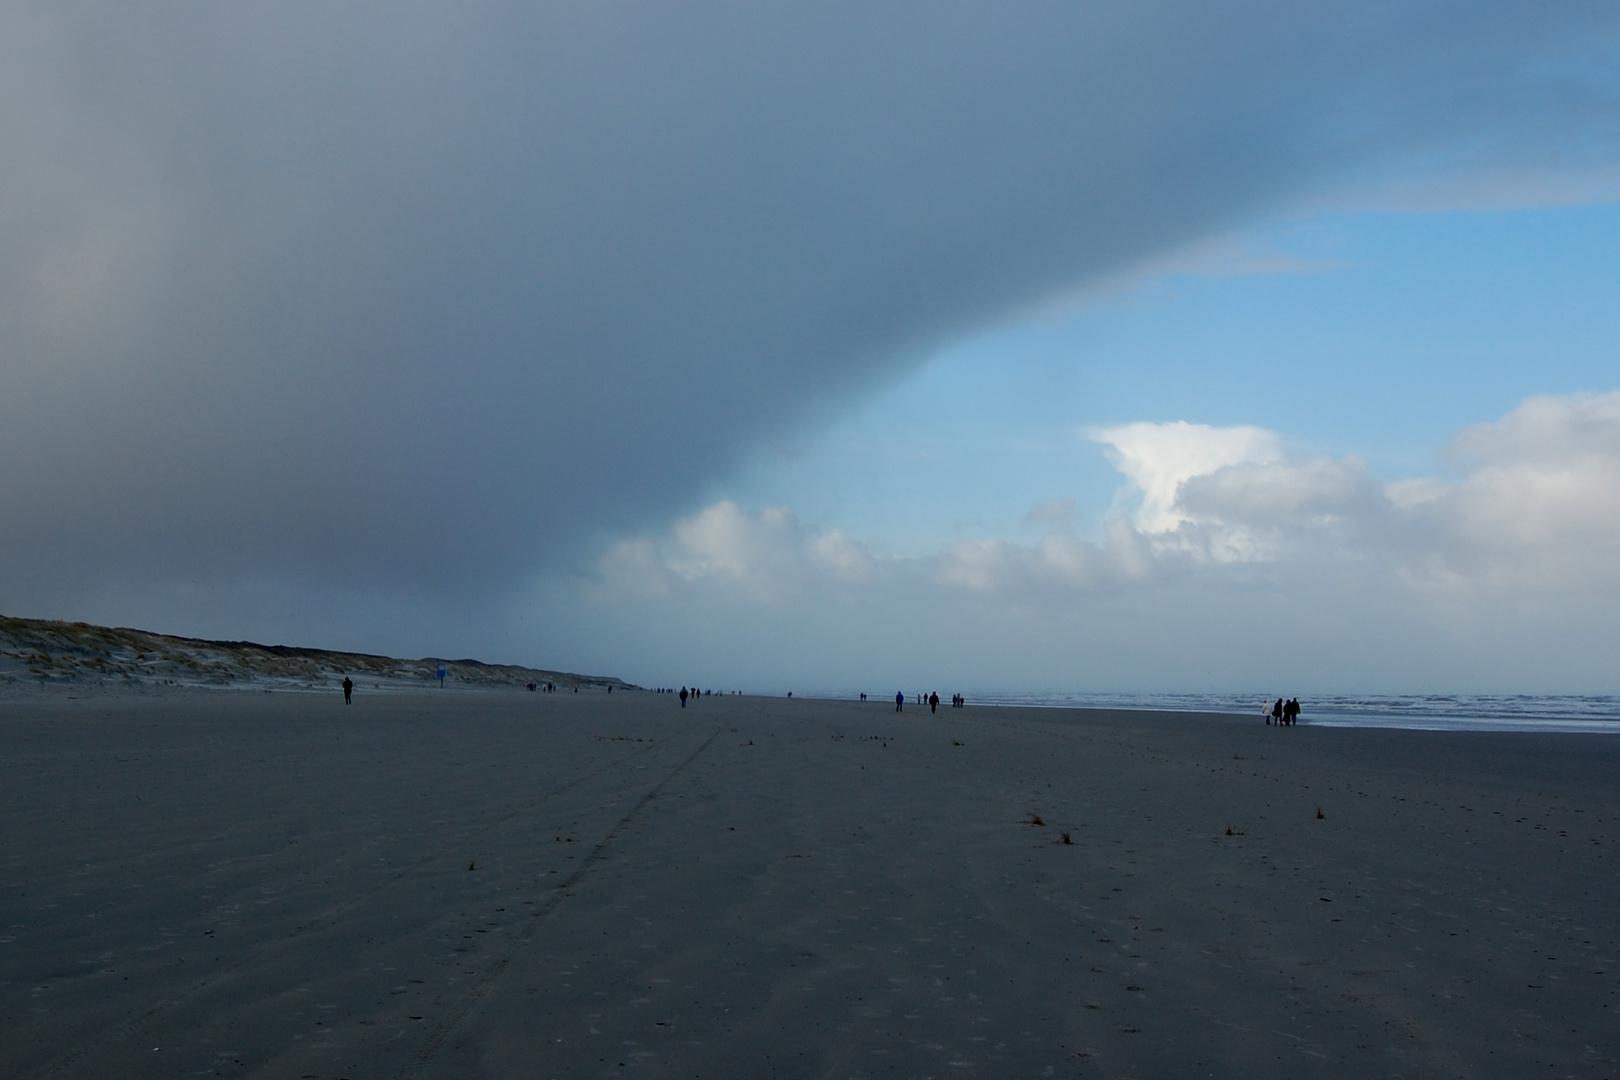 Blauer Himmel vs dunkle Wolken